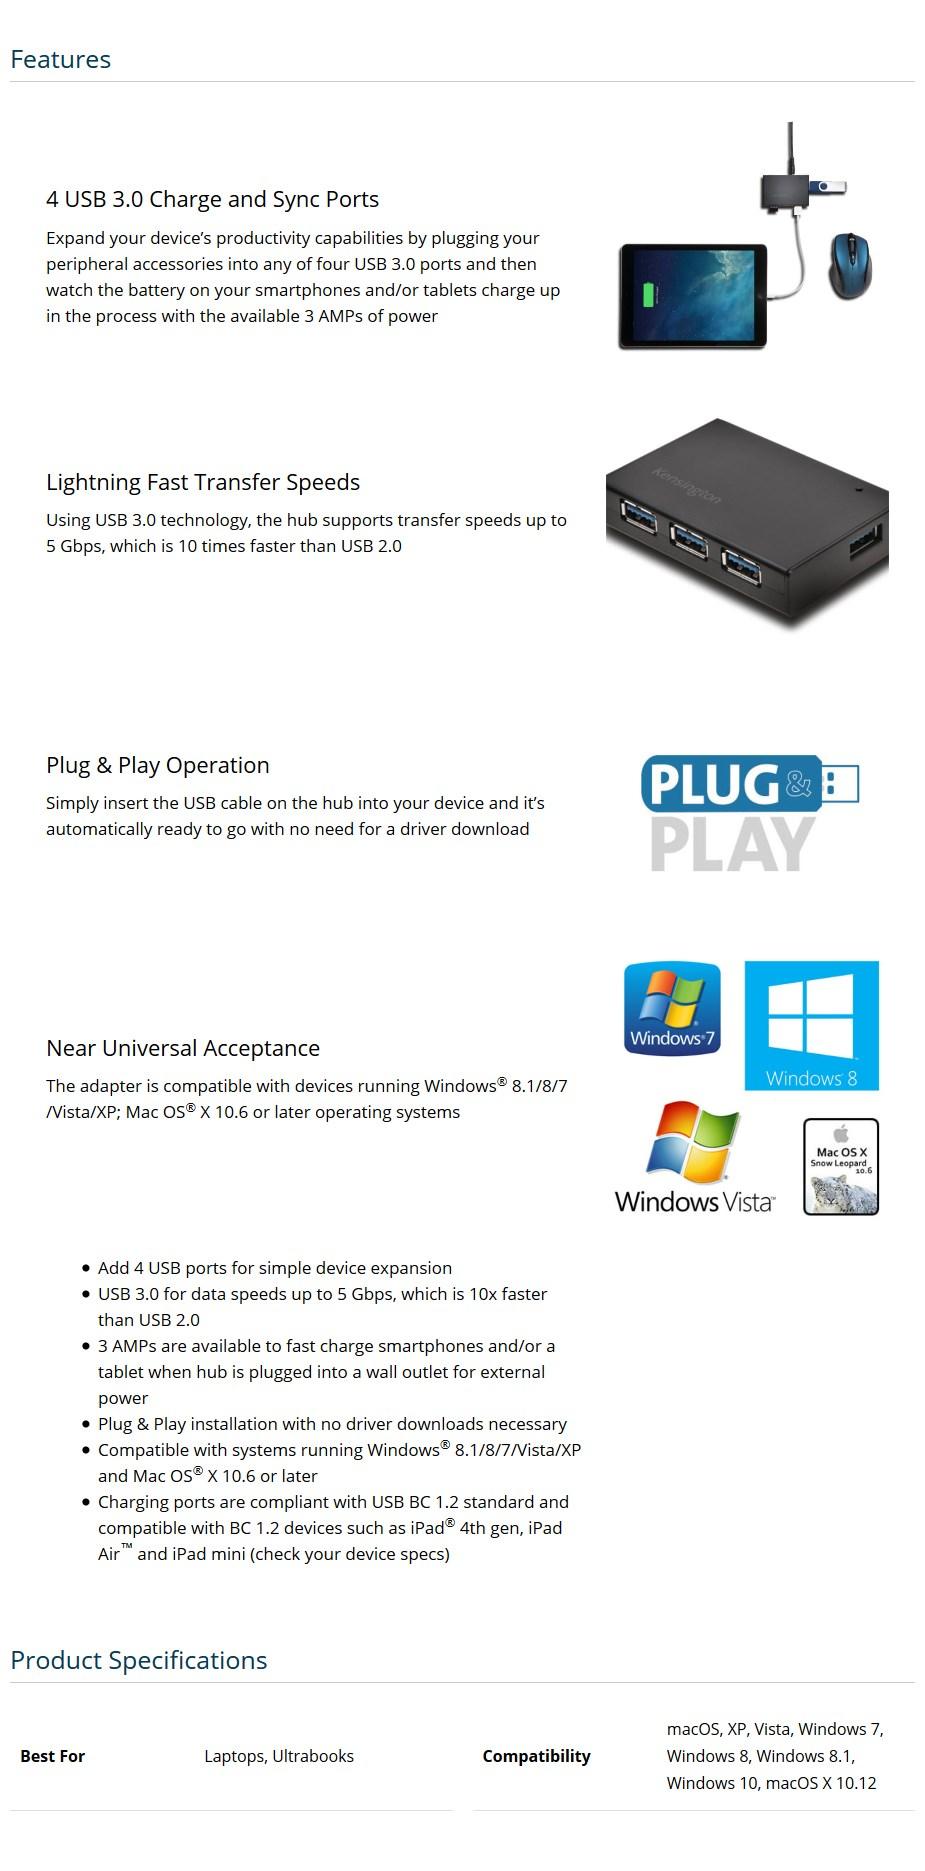 Kensington UH4000C USB 3.0 4-Port Hub and Charger - Desktop Overview 1